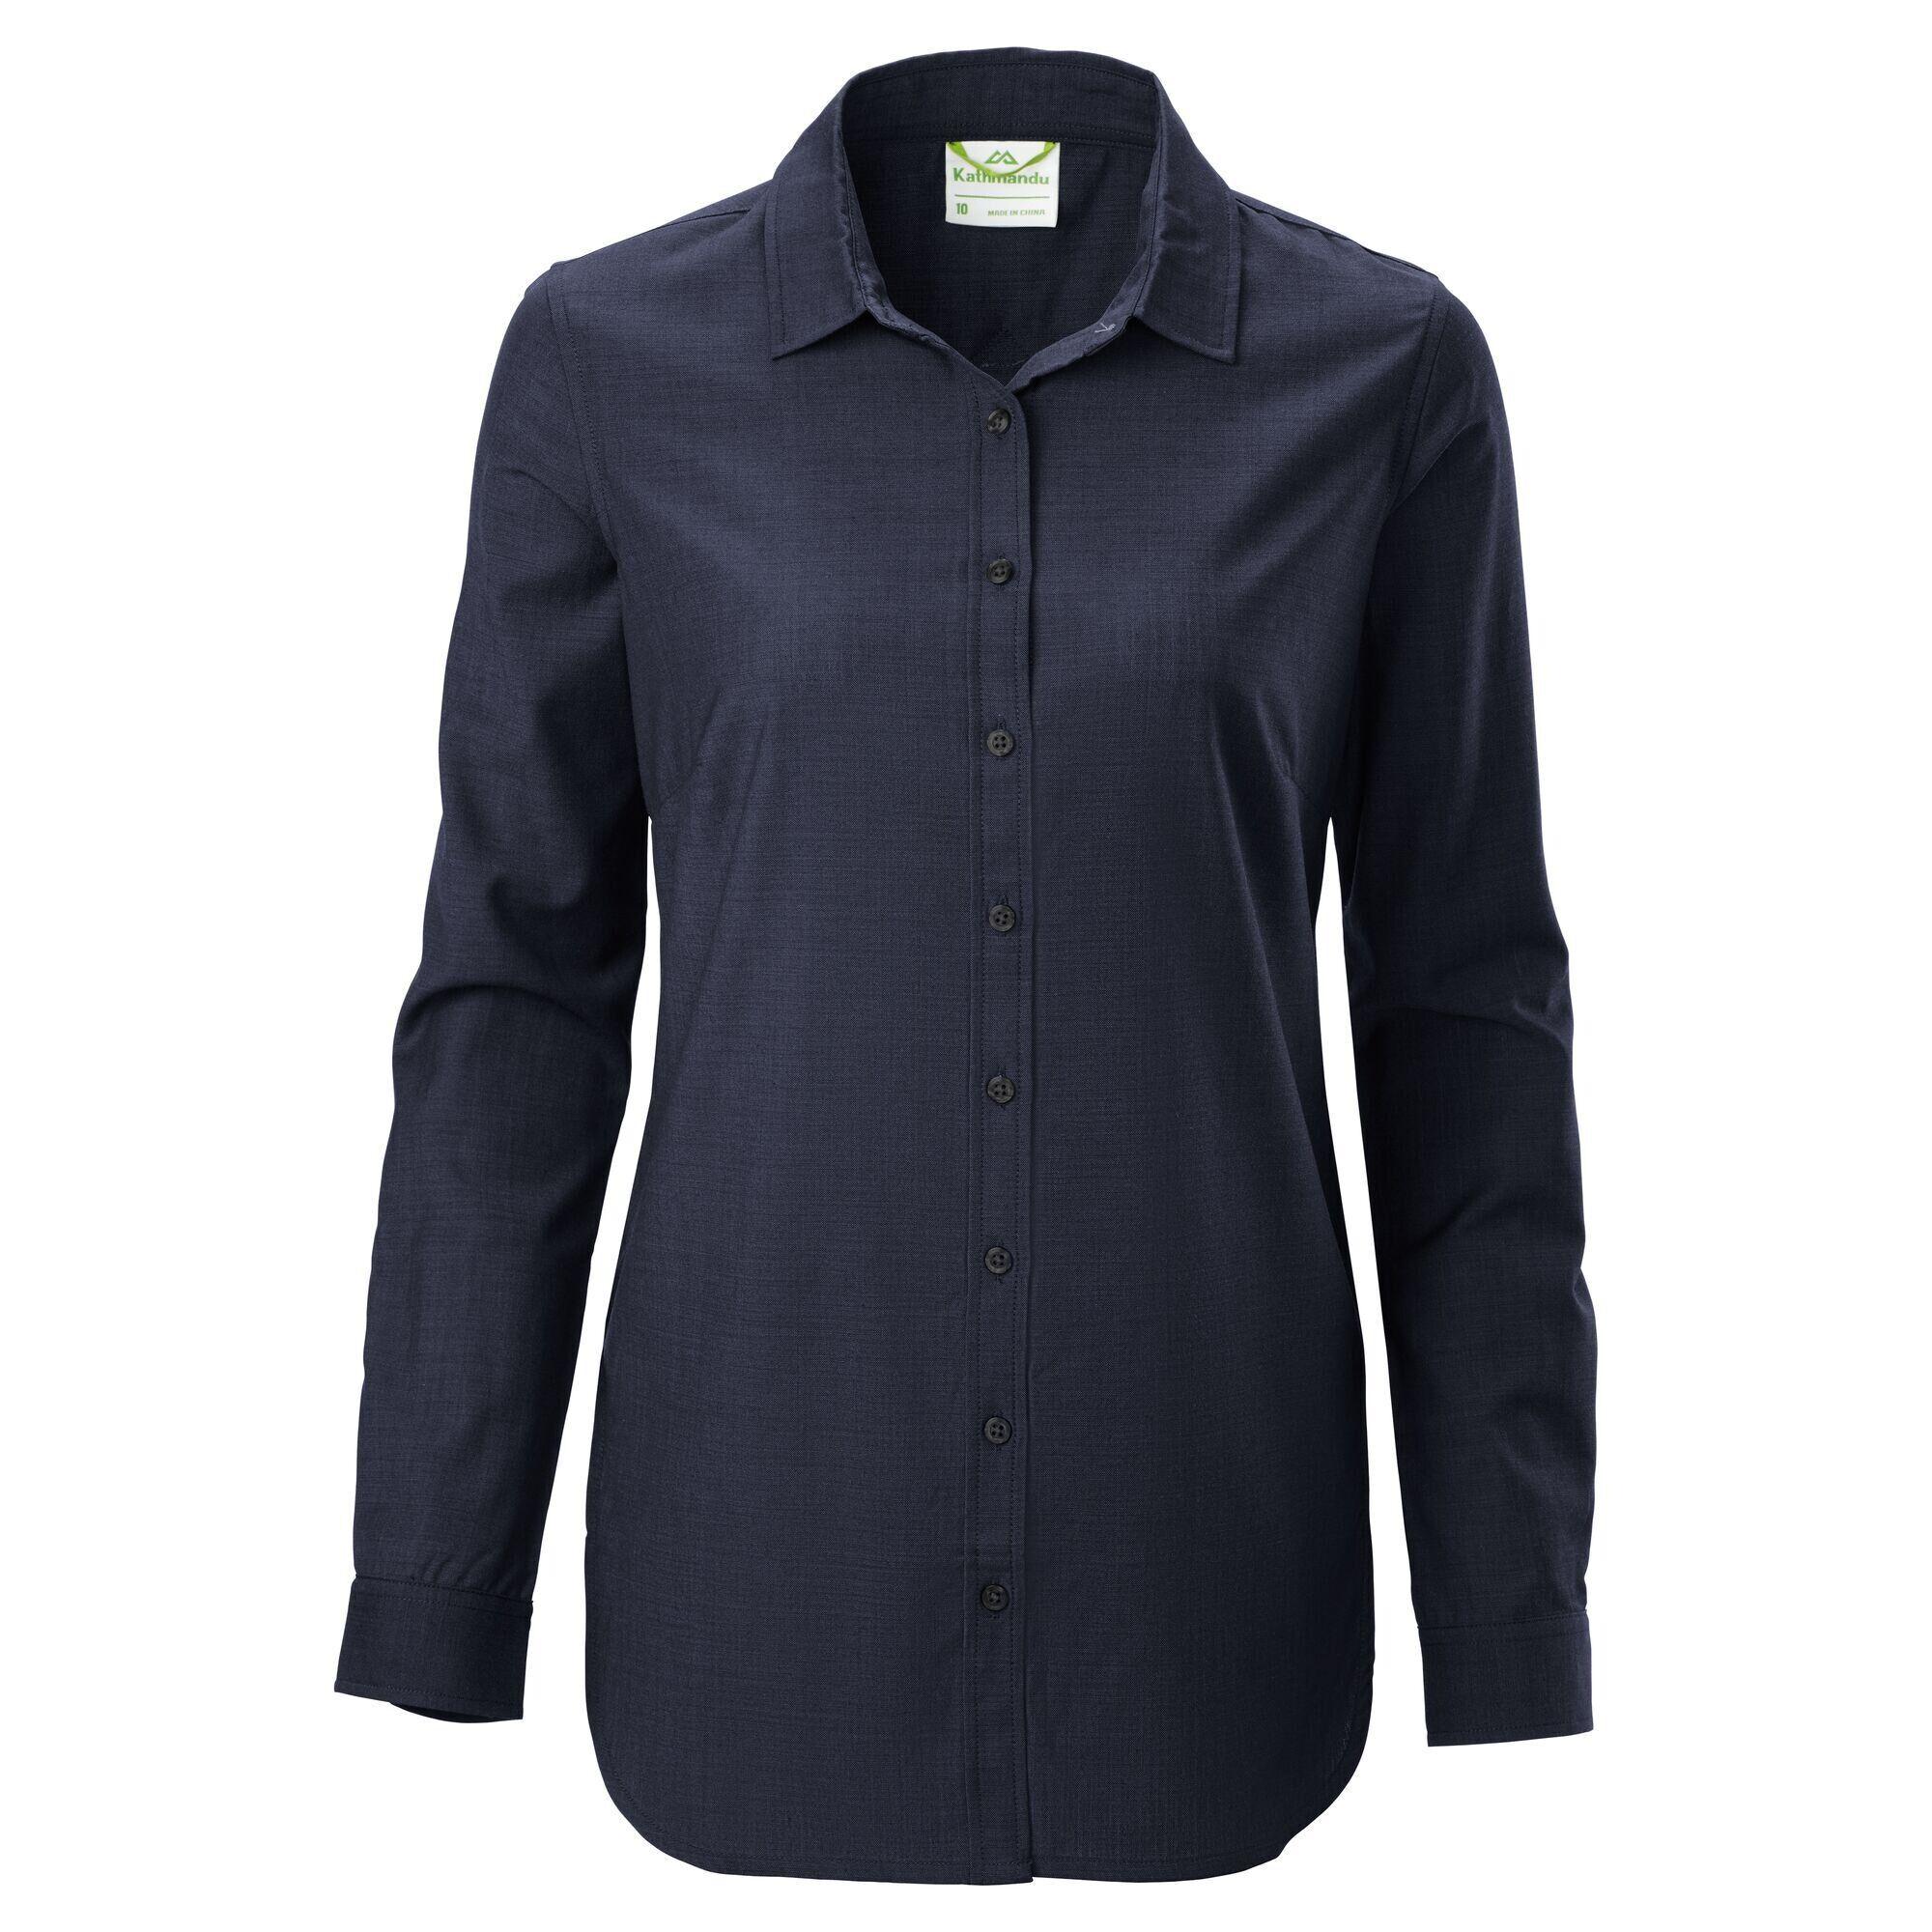 Kathmandu Tomar Women's Merino Long Sleeve Shirt  - Darkest Navy - Size: US 4